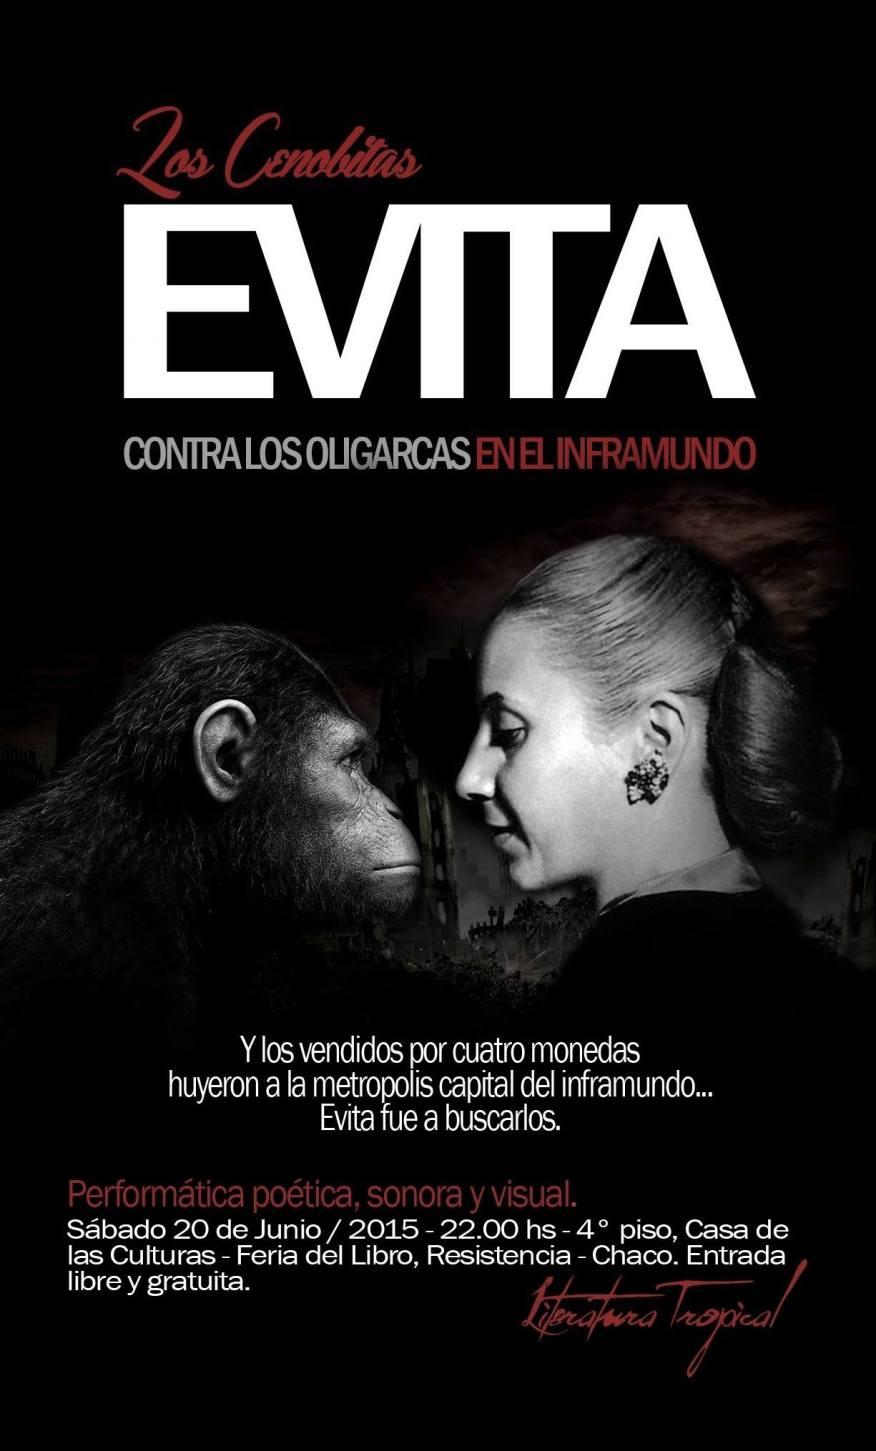 Evita FLYER